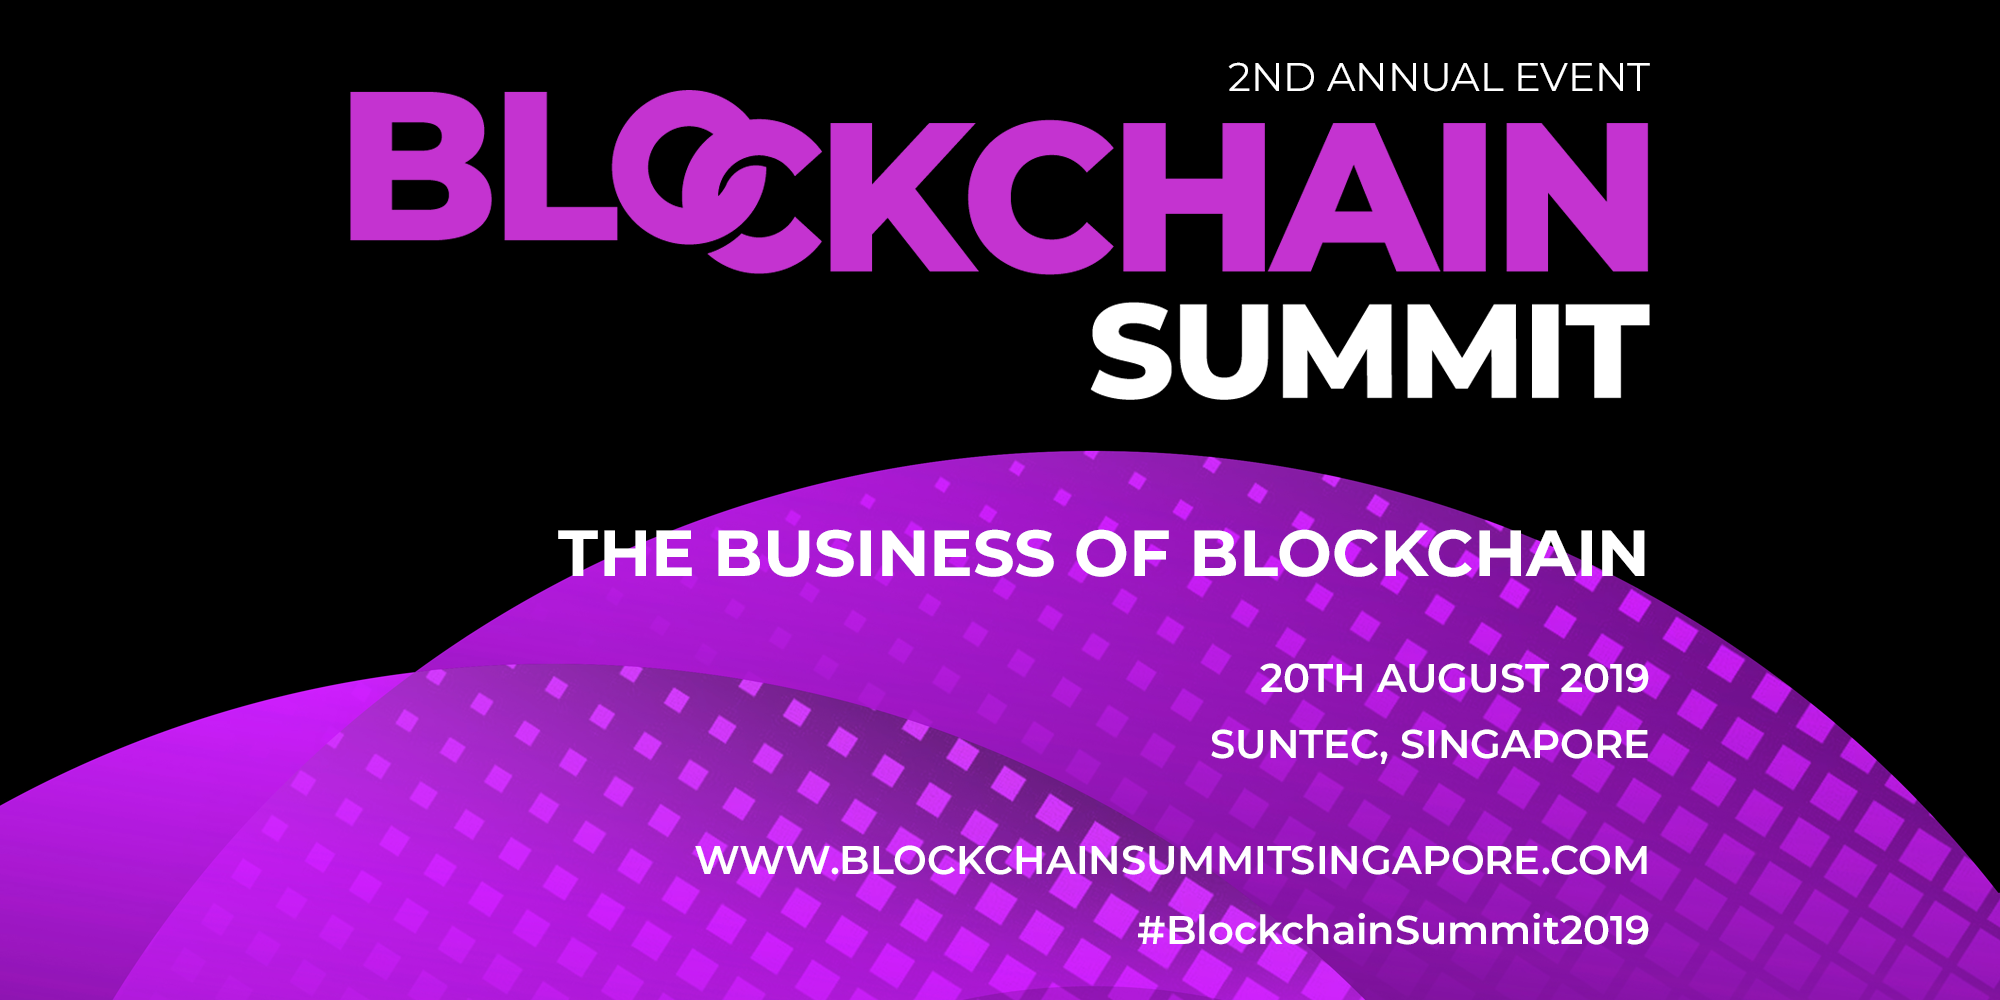 Suntec gears up for Blockchain Summit 2019